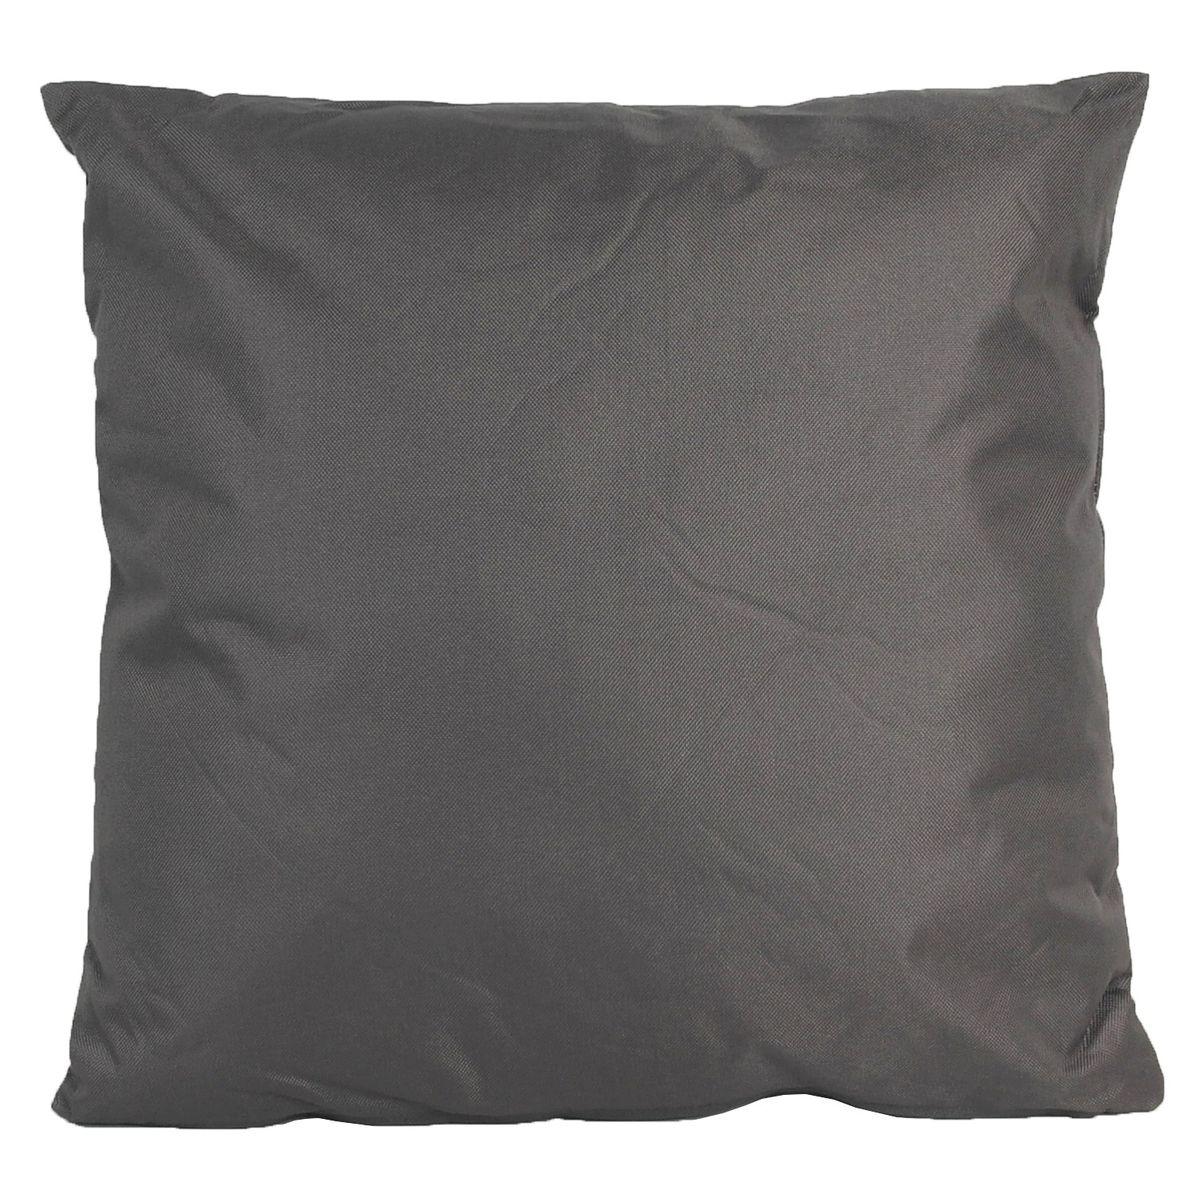 outdoor lounge kissen 45x45cm dekokissen wasserfest. Black Bedroom Furniture Sets. Home Design Ideas